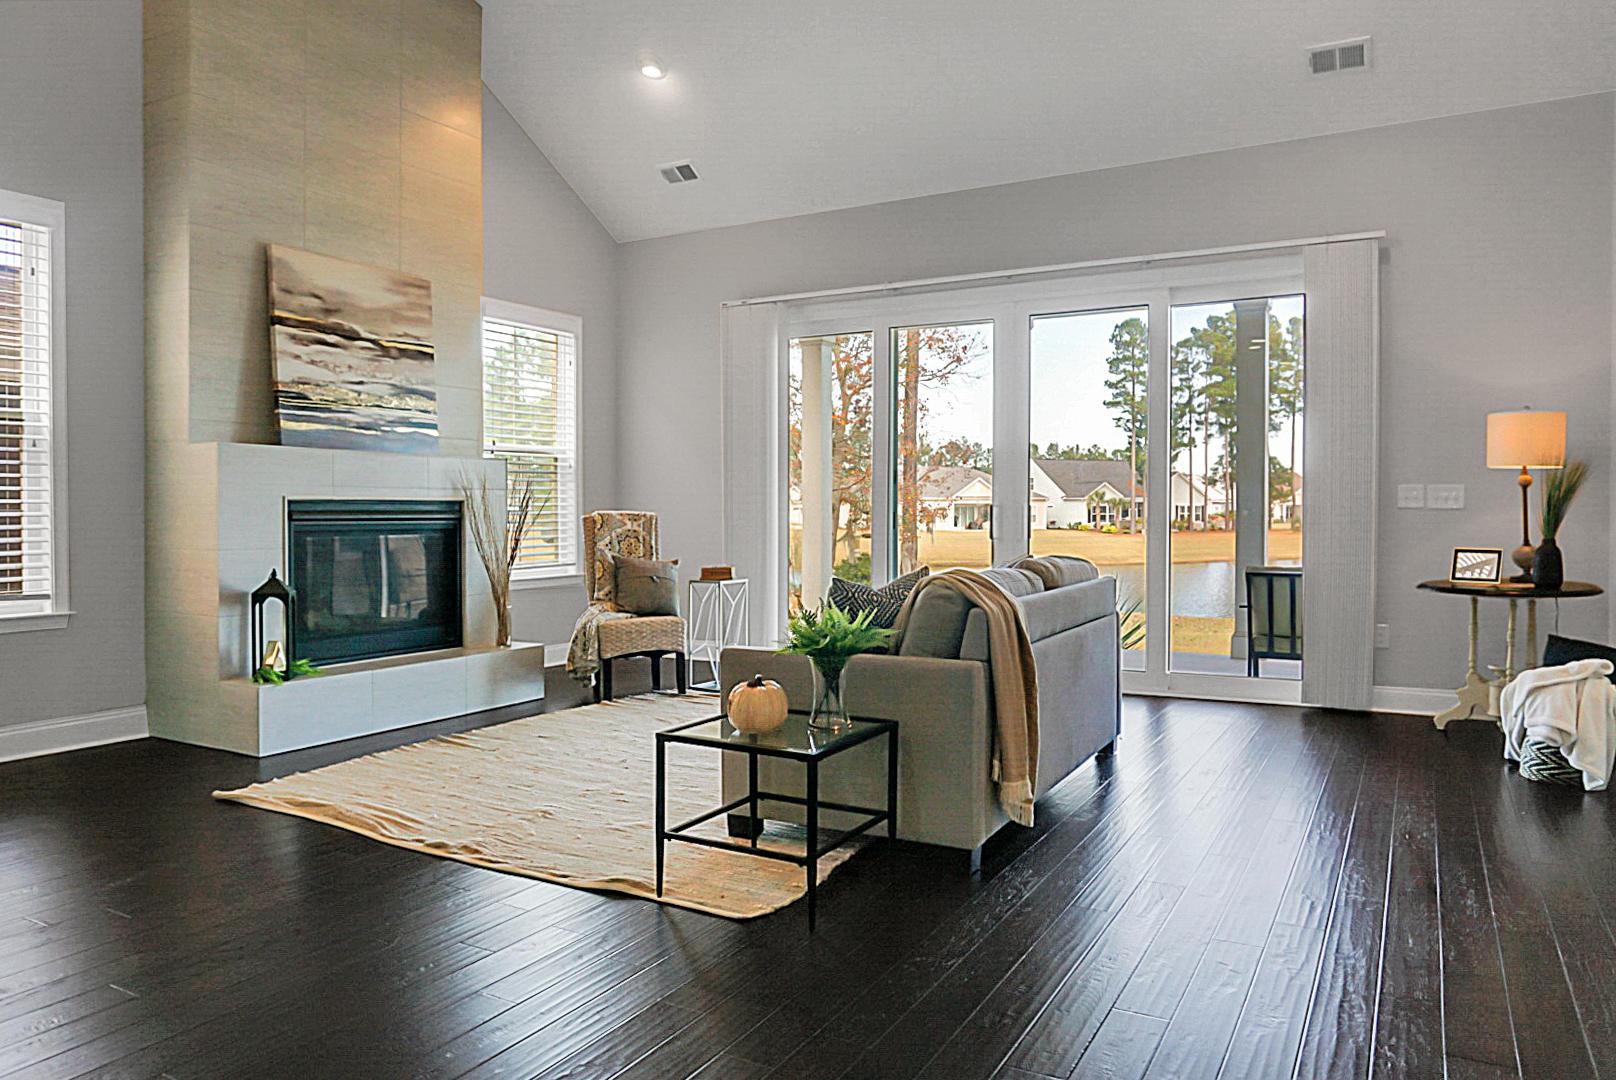 Cane Bay Plantation Homes For Sale - 284 Calm Water, Summerville, SC - 52